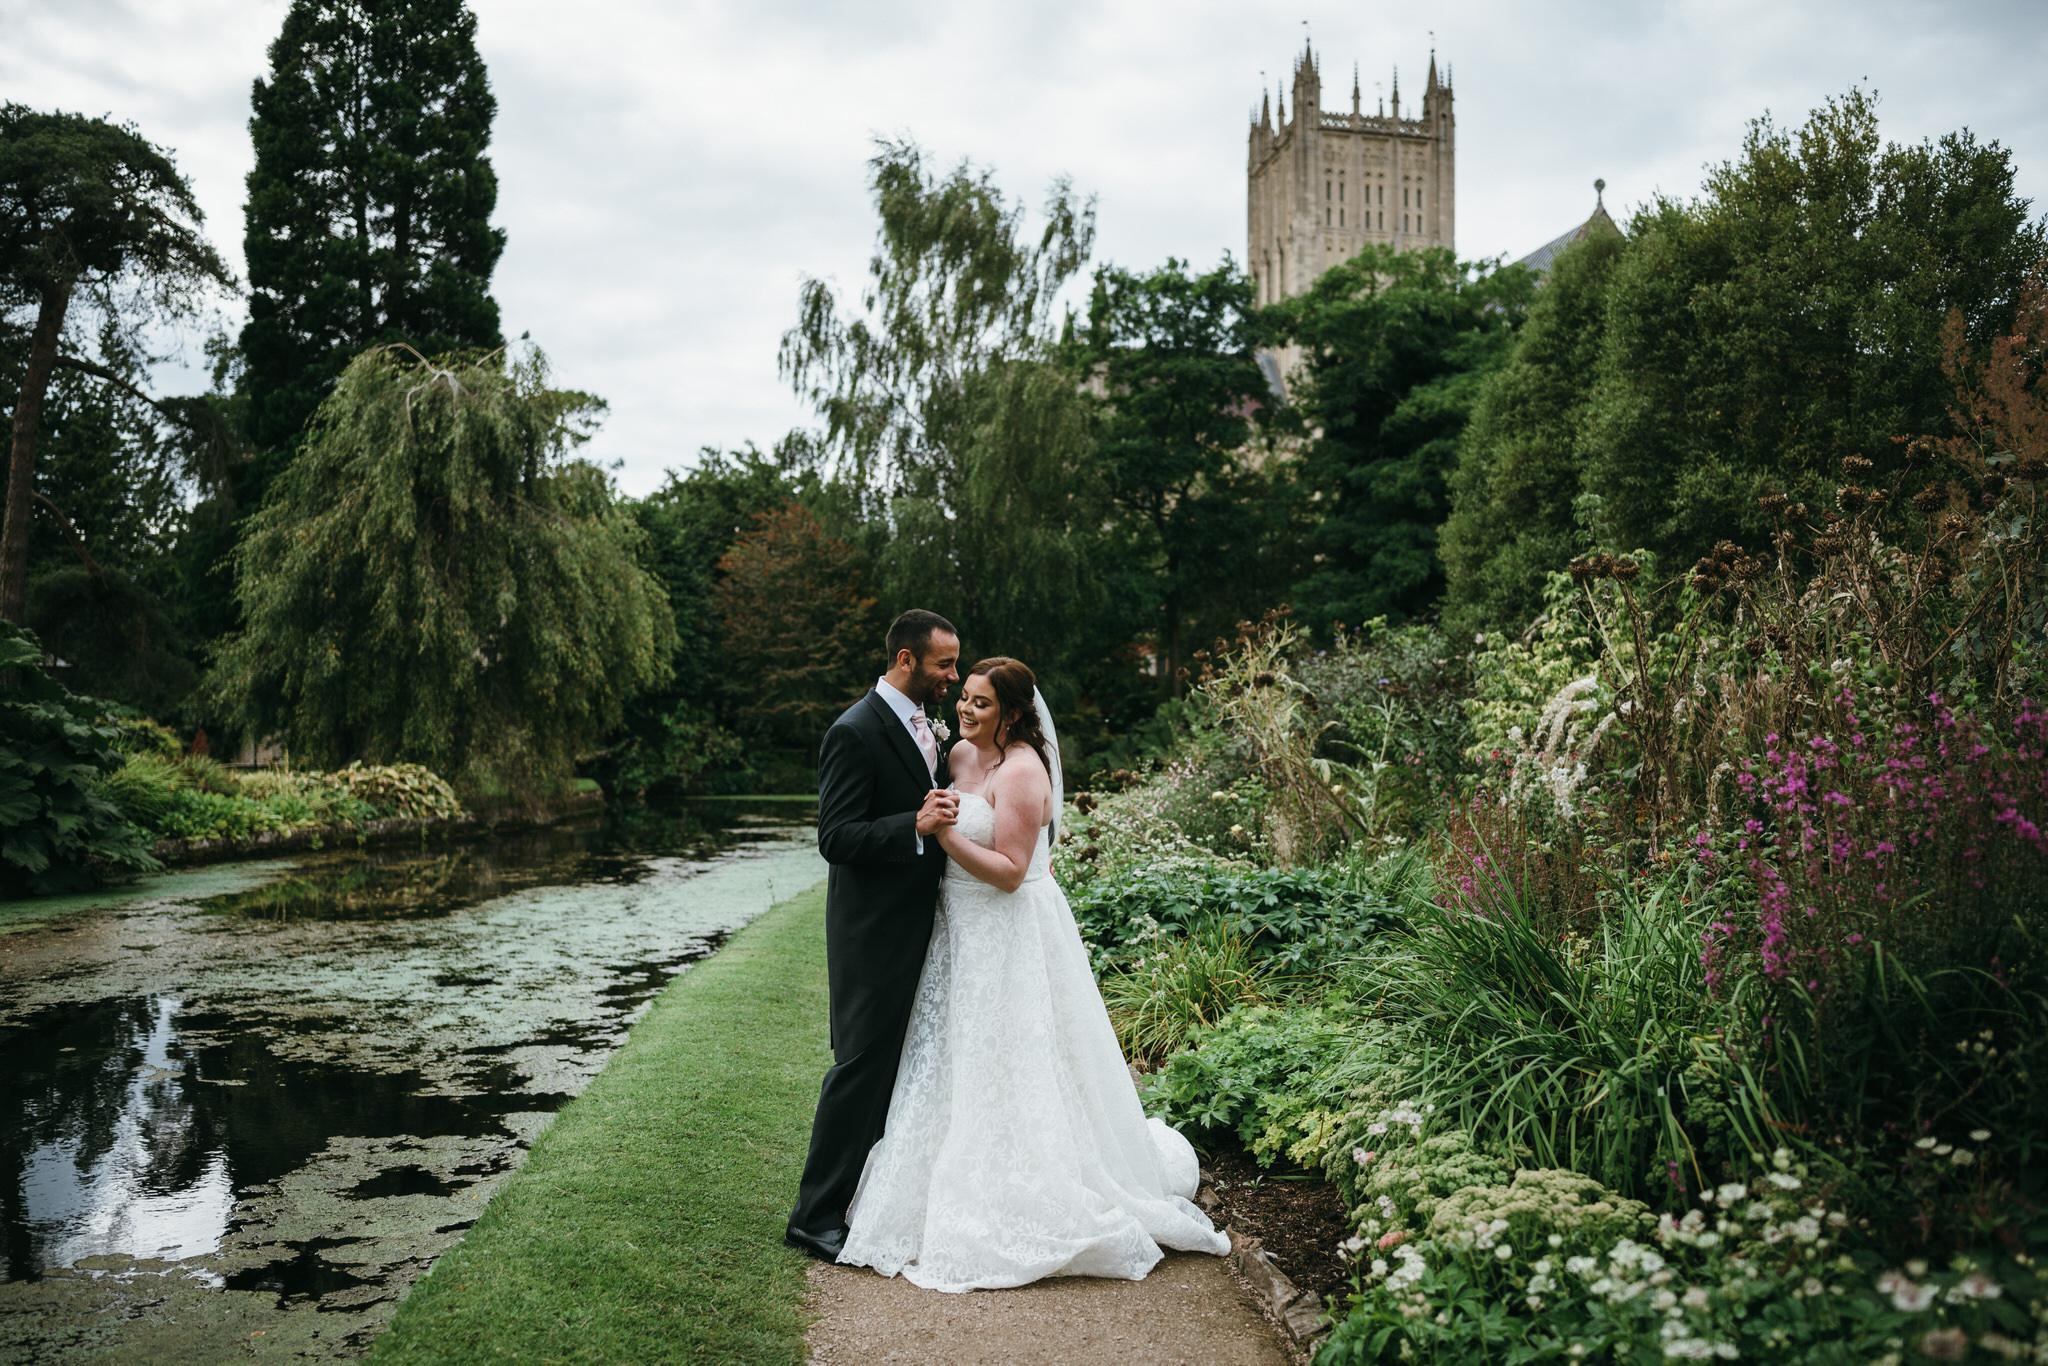 Bride and Groom at Bishops palace